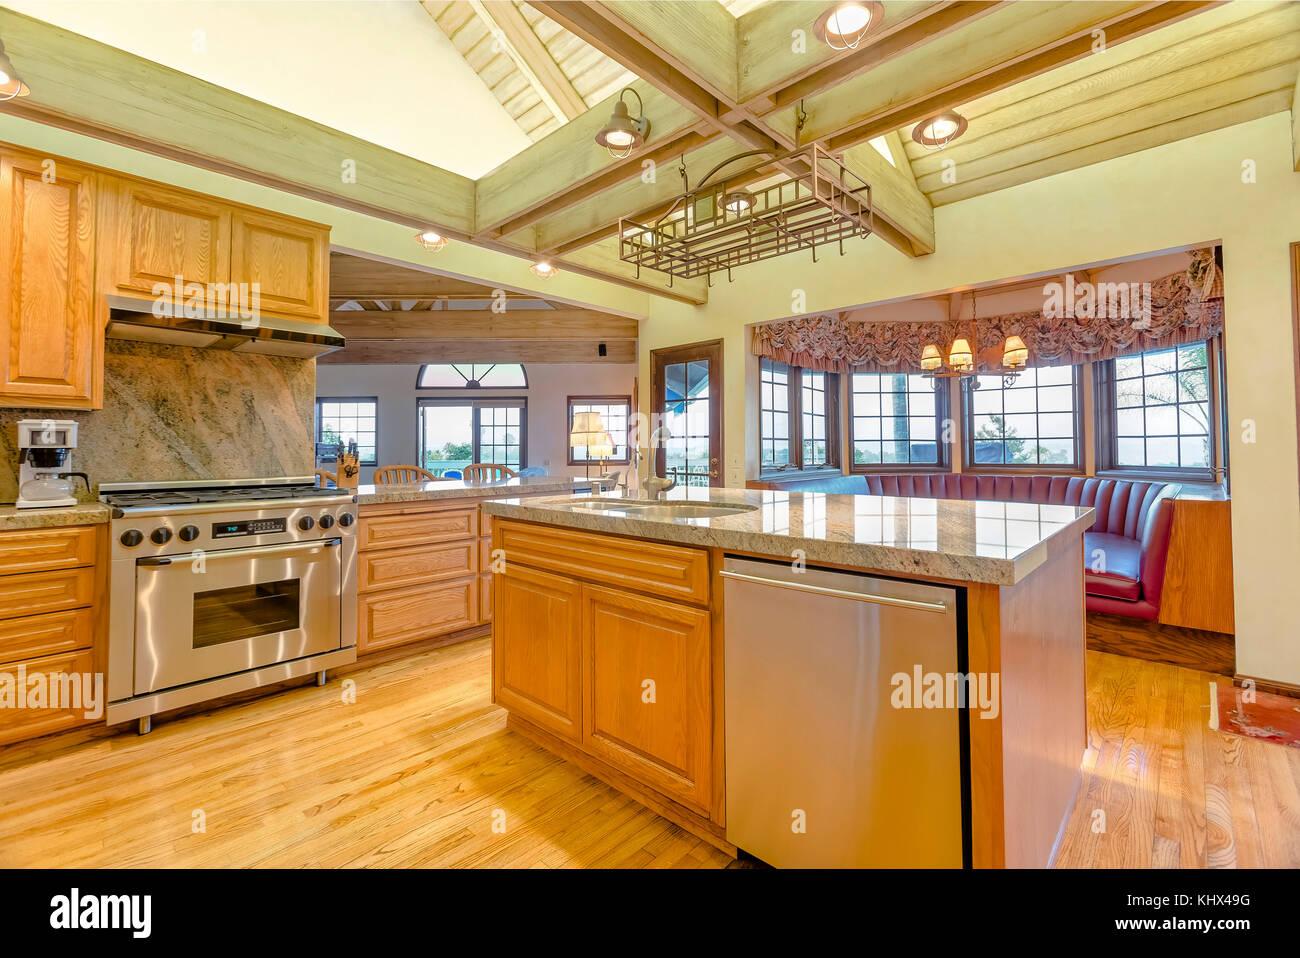 Kitchen With Beams Stockfotos & Kitchen With Beams Bilder - Seite 2 ...